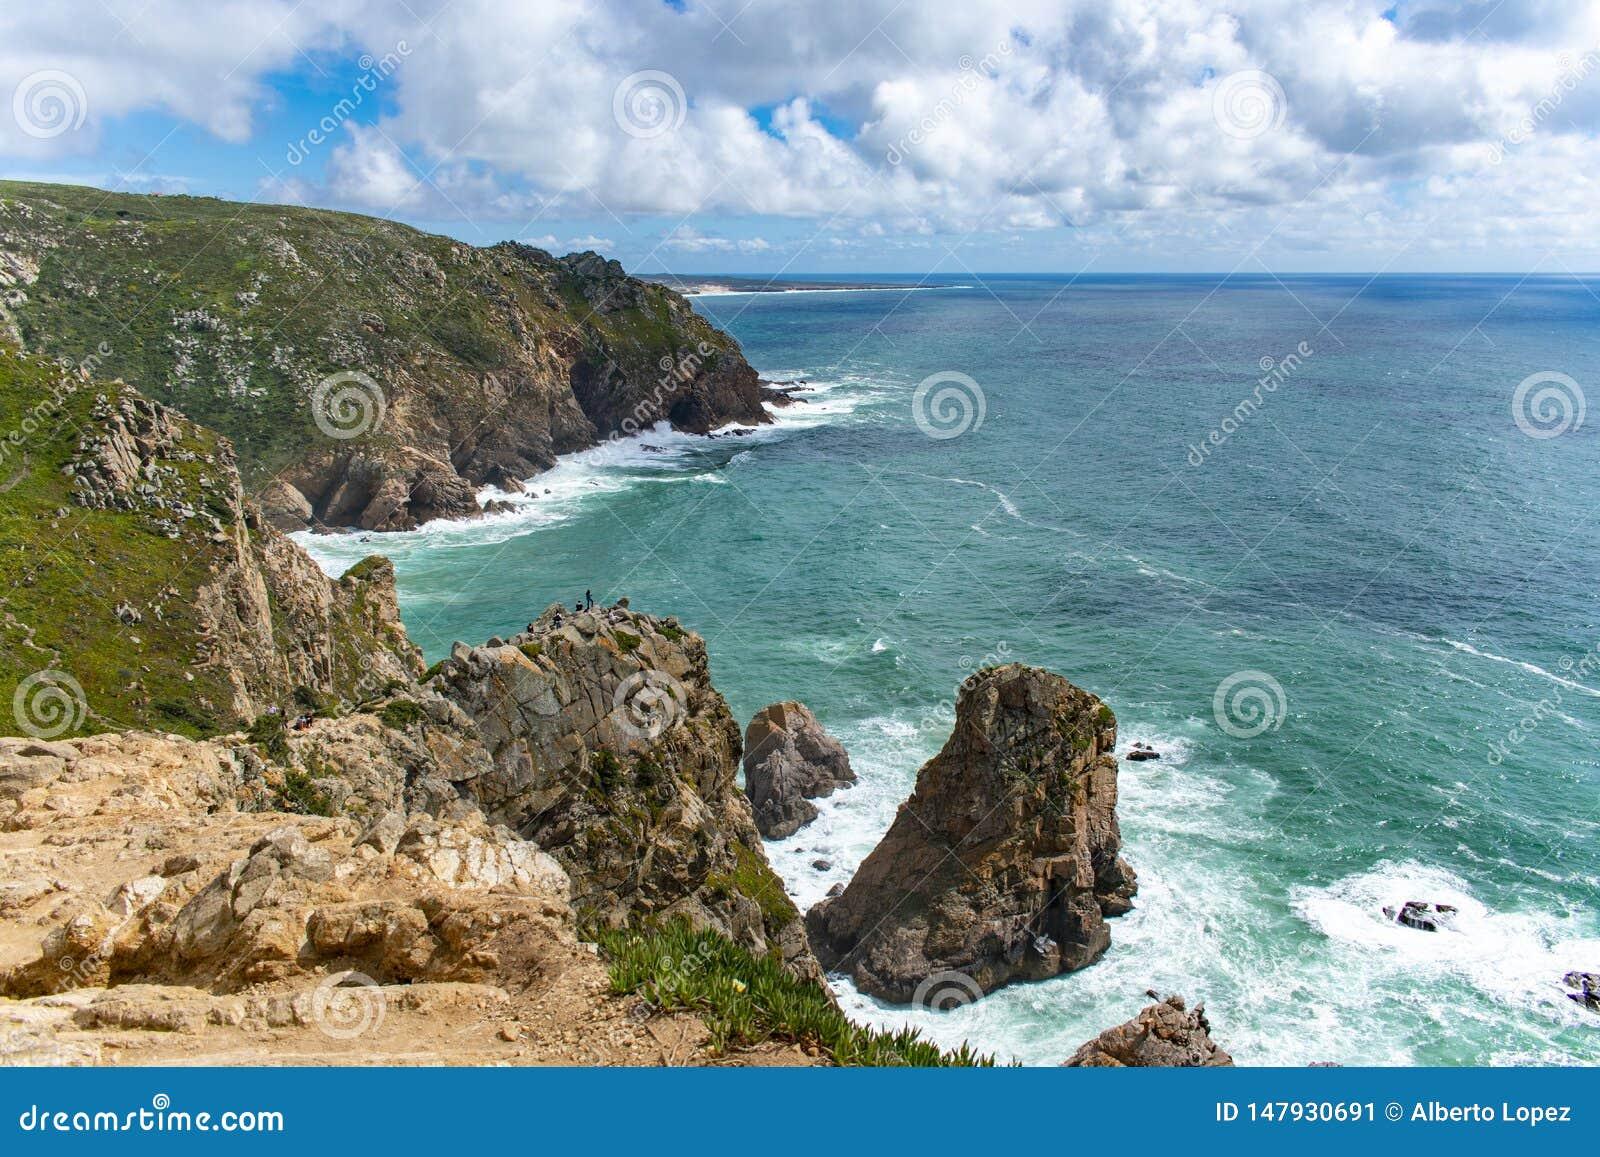 Sea landscape with high cliffs in Cabo da Roca